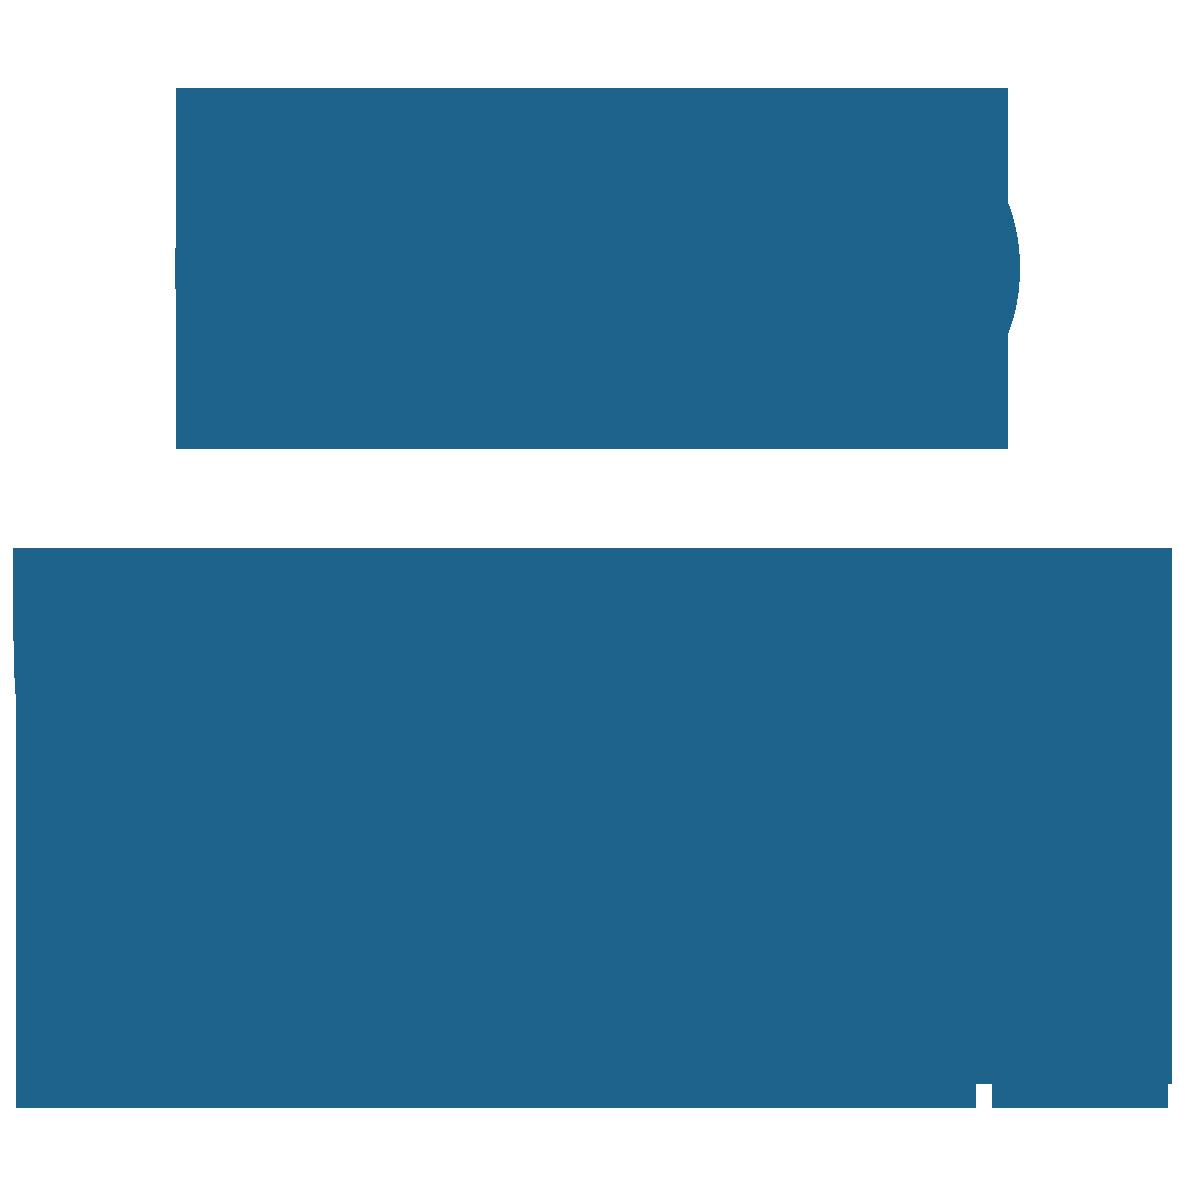 centered image